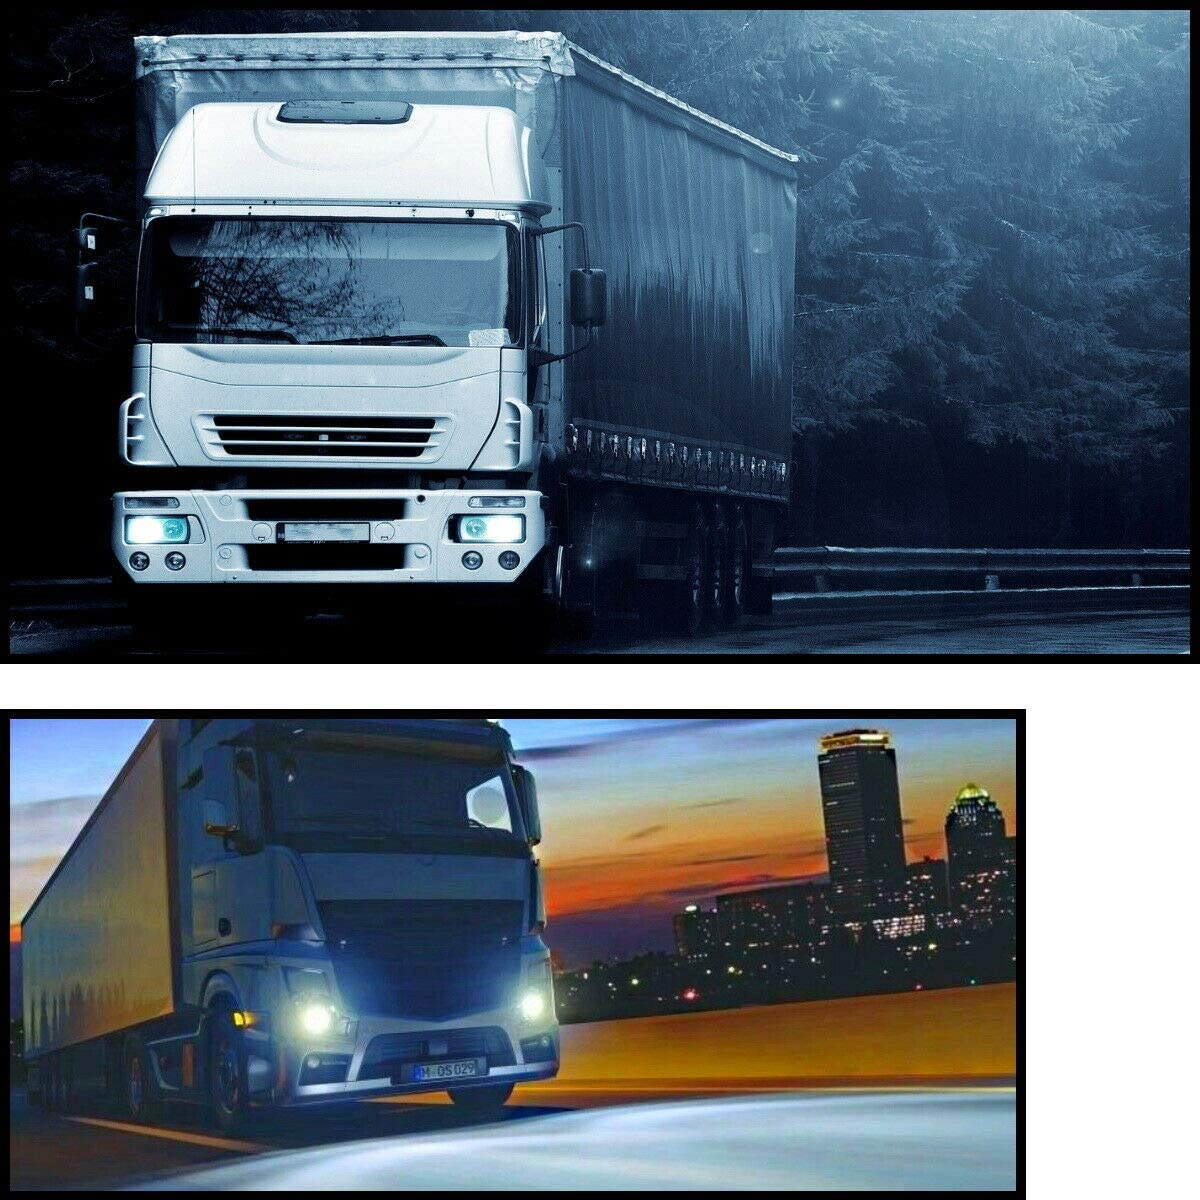 2x H7 24v 100w 6000k Px26d Nfz Lkw Bus Halogen Lampen Xenon Effekt Super White 100 Watt Jurmann Original Auto